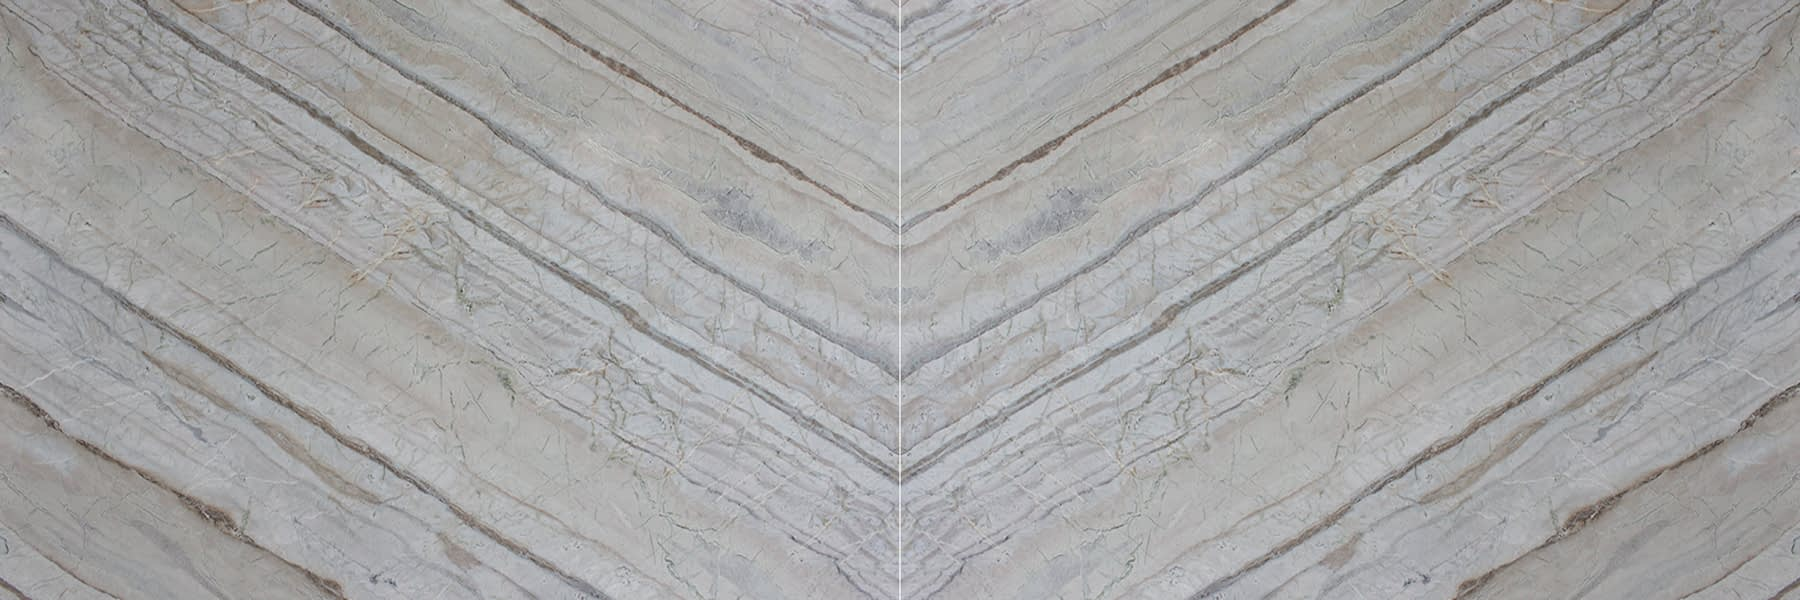 Corteccia Quartzite Horizontal Bookmatch A